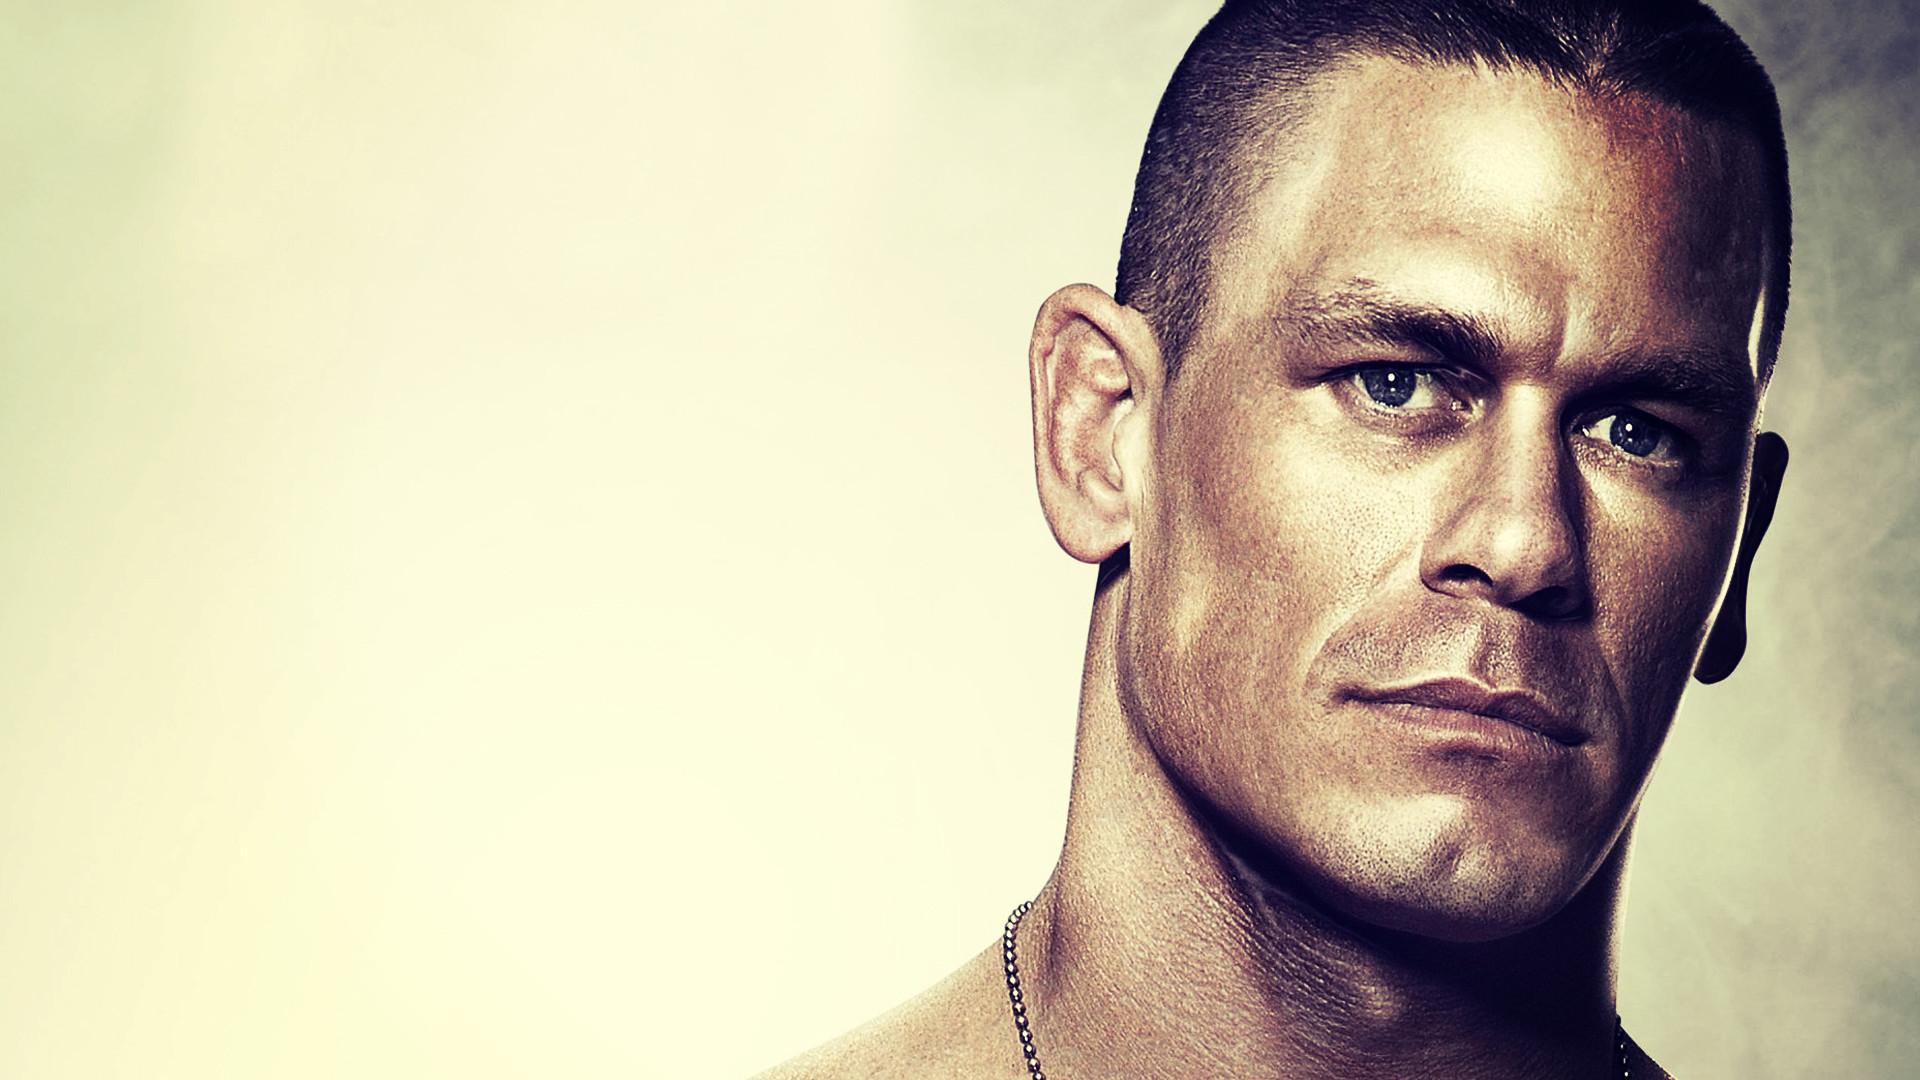 John Cena WWE Wallpapers HD 1080p | HDWallWide.com